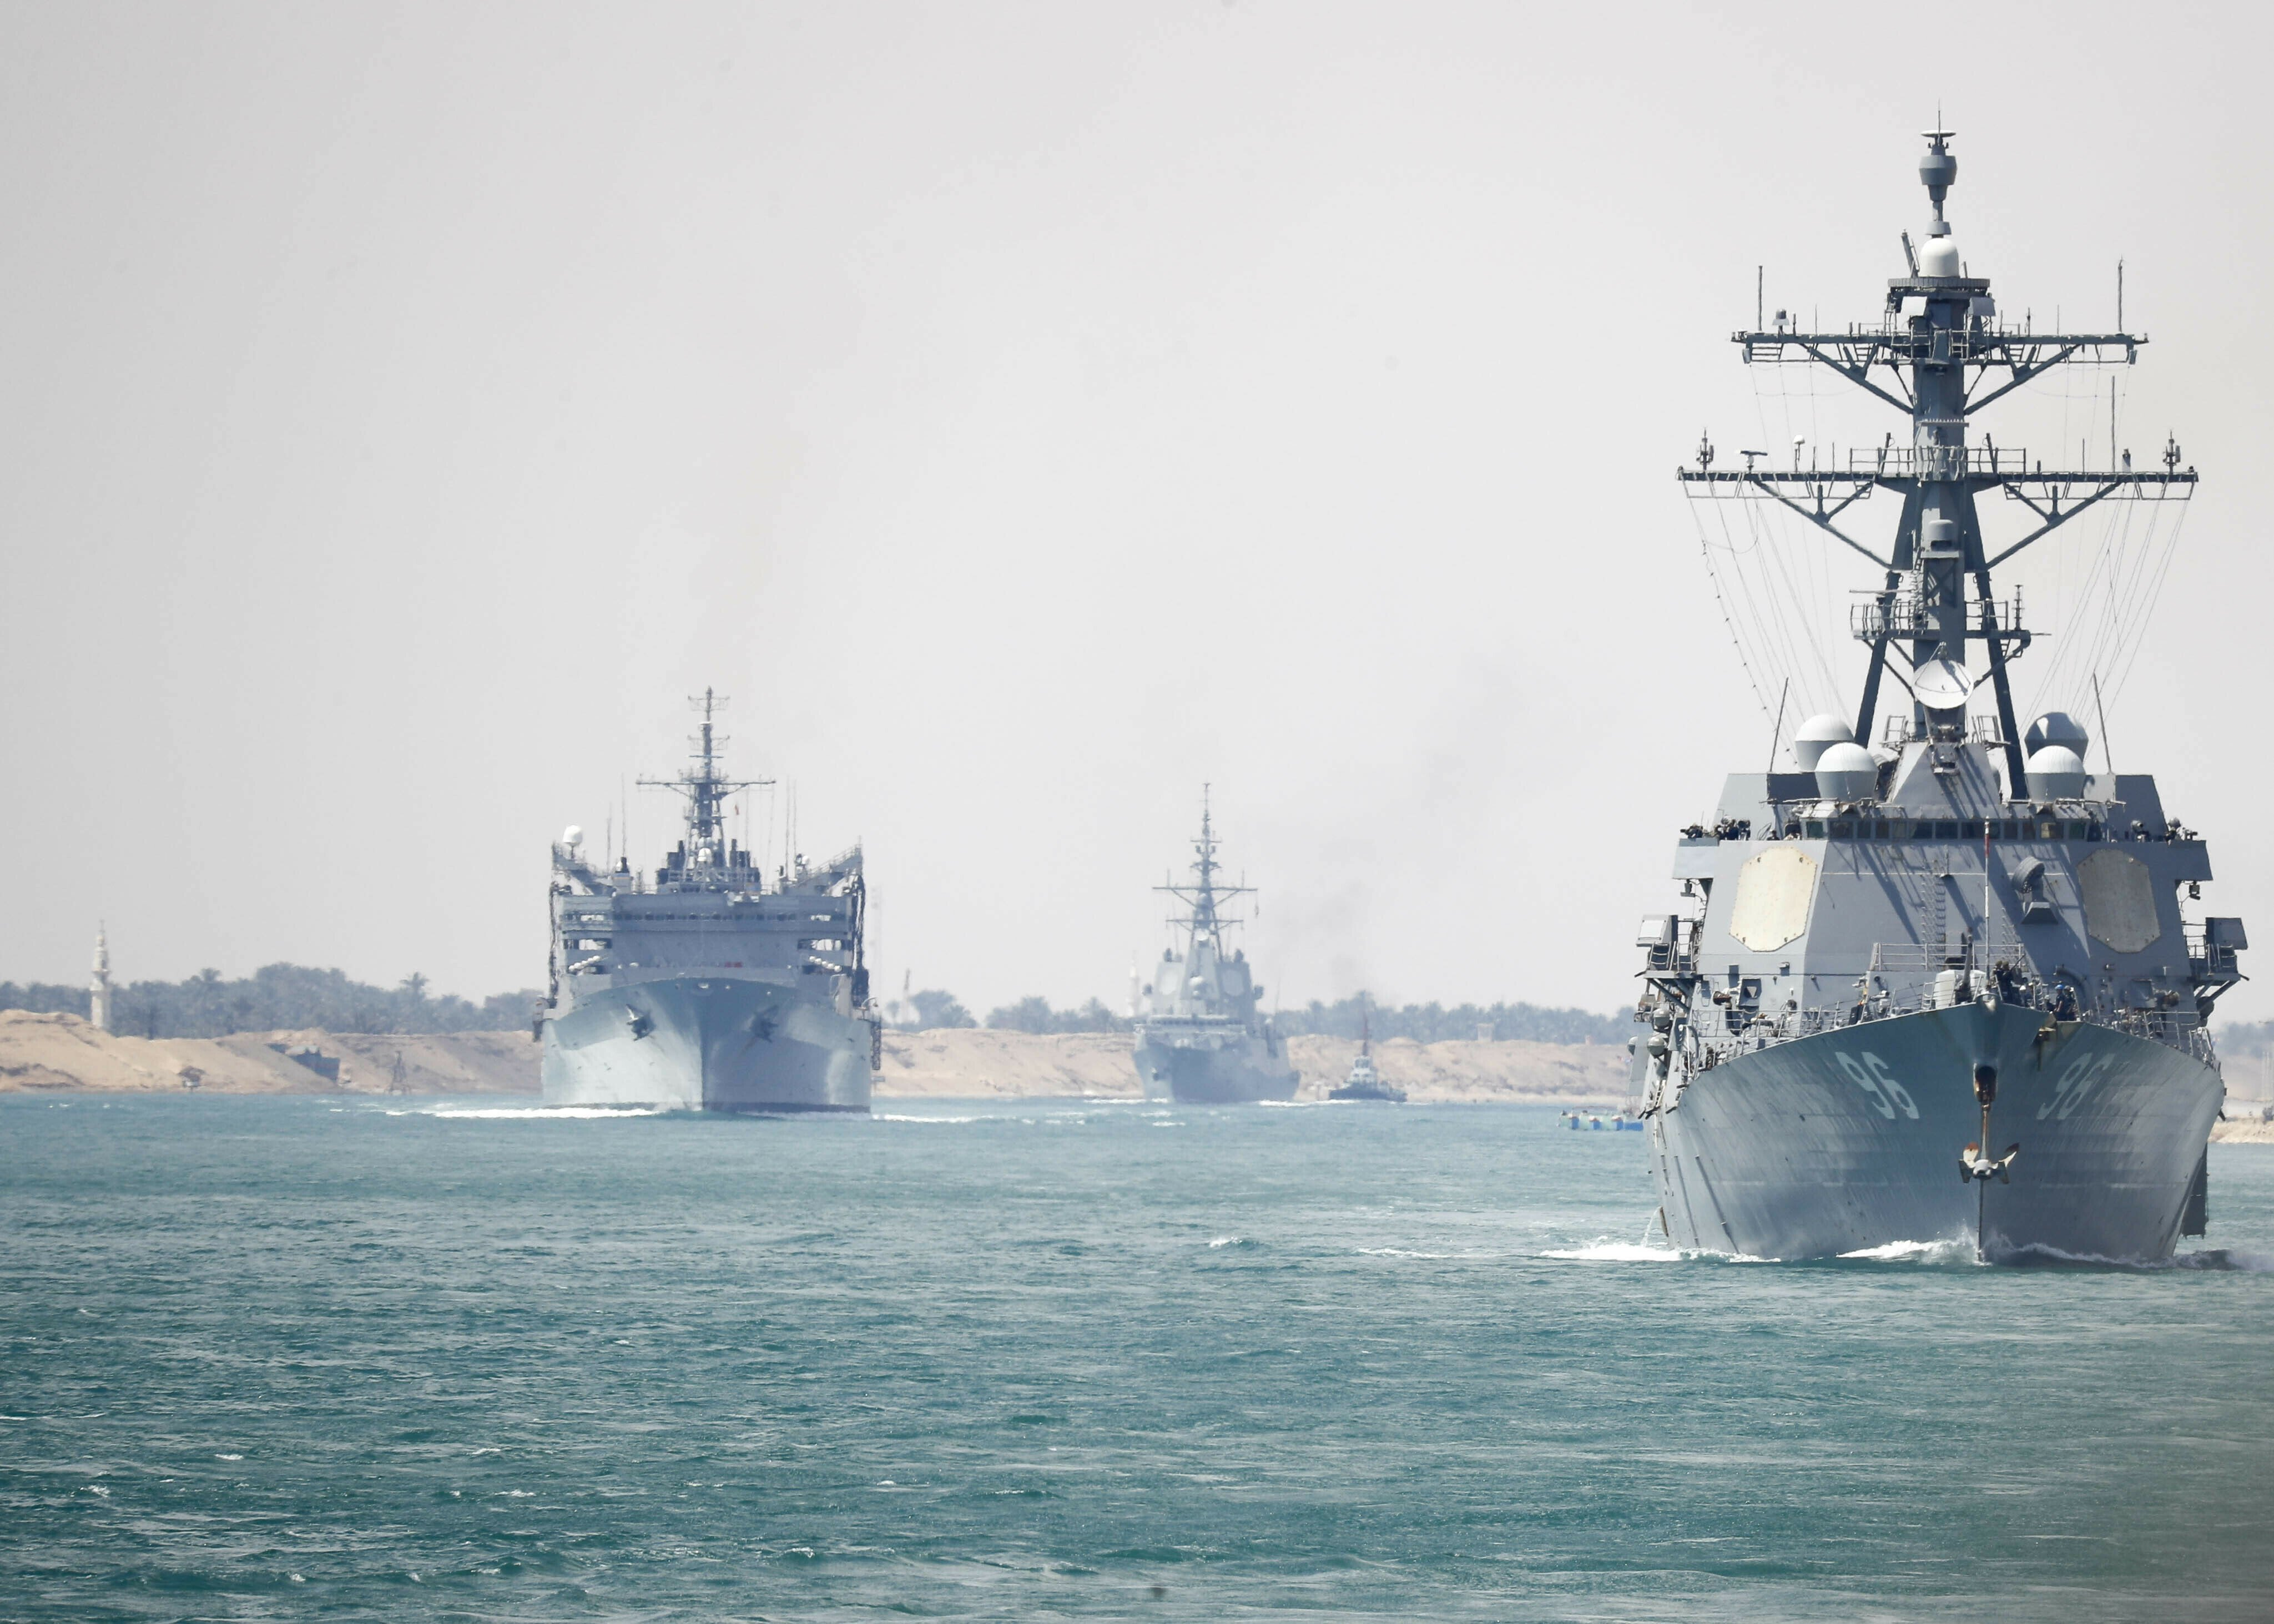 Golfo - Usa - Iran - Hormuz